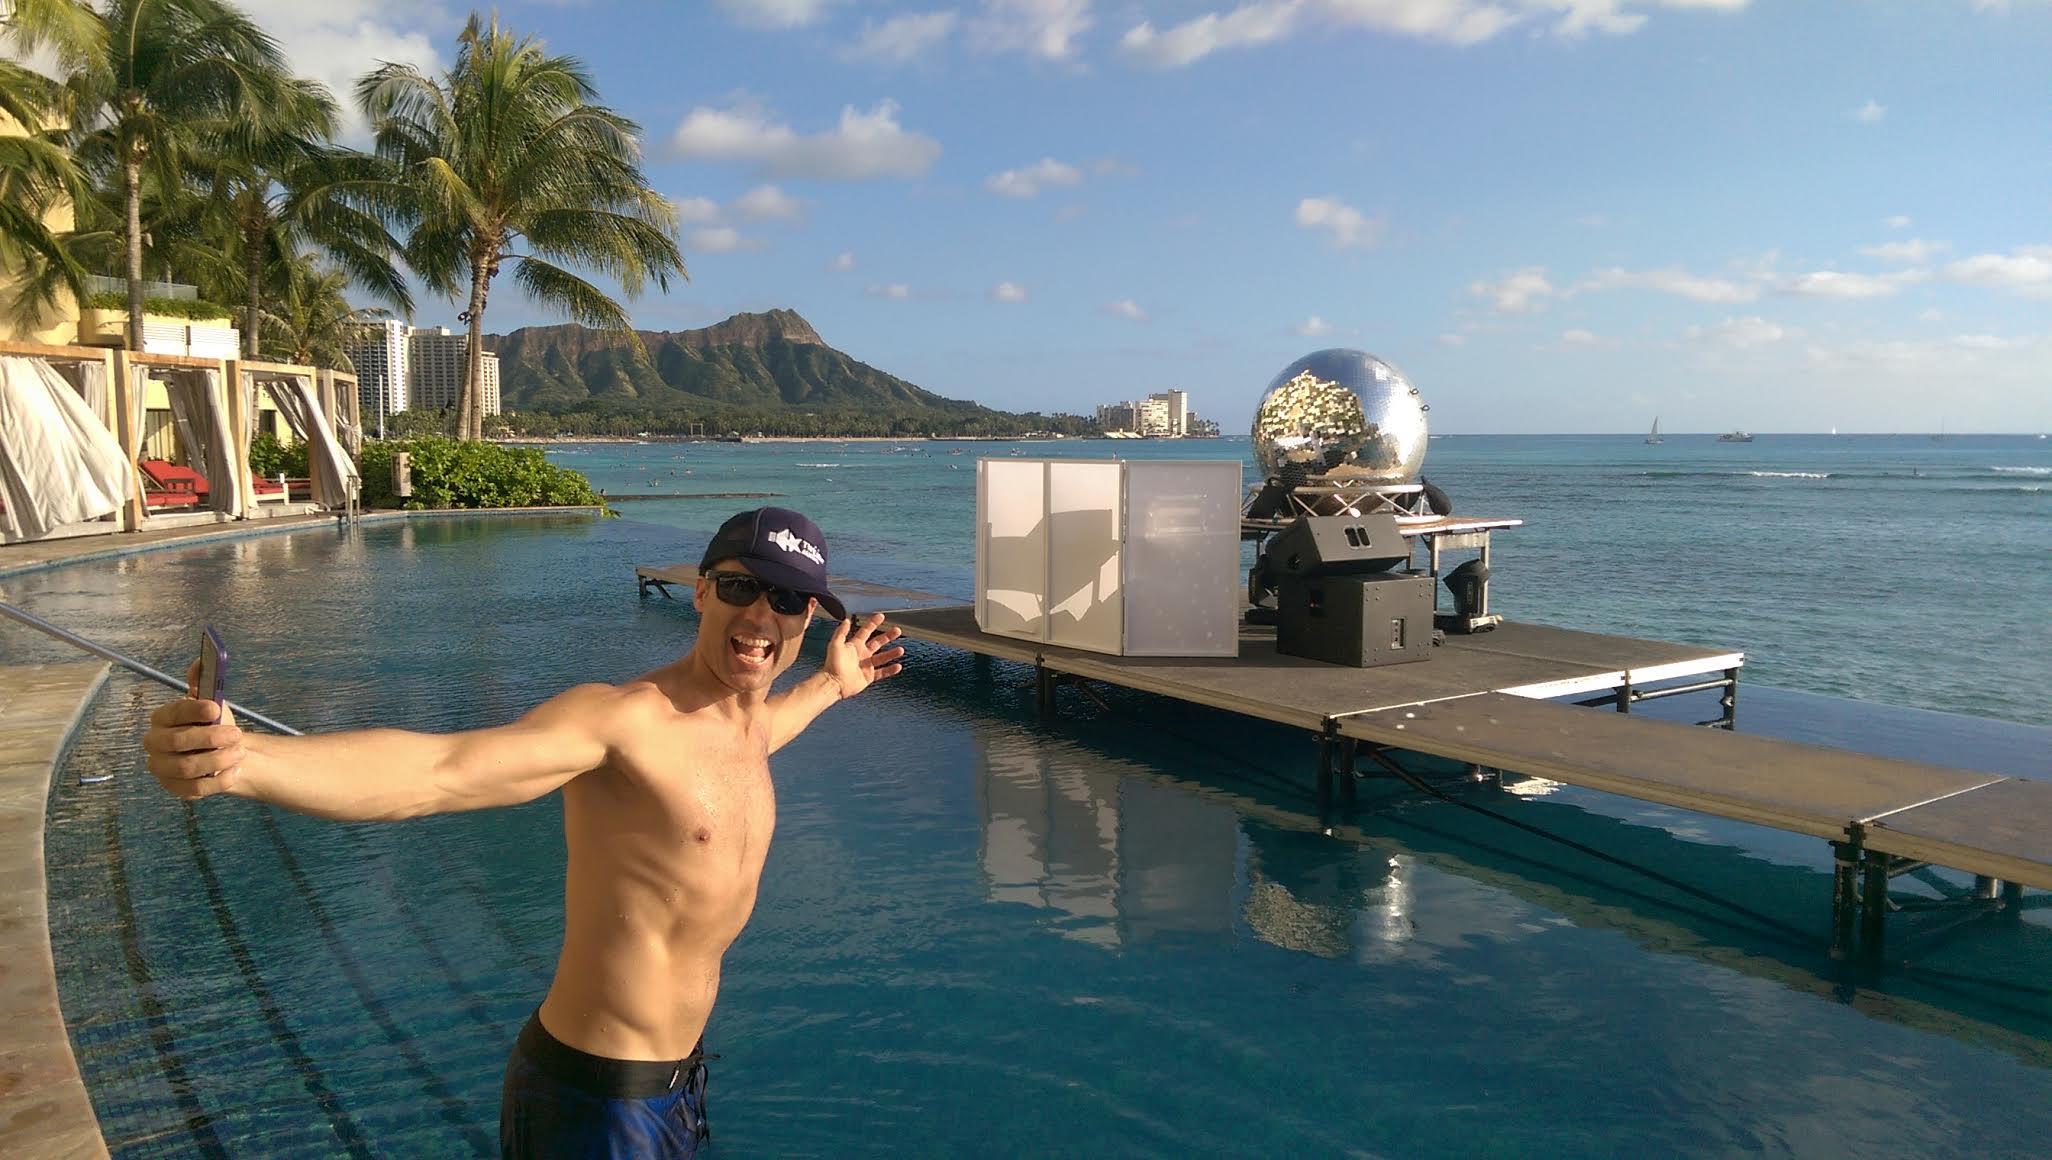 Sheraton Hotels Rumfire Waikiki